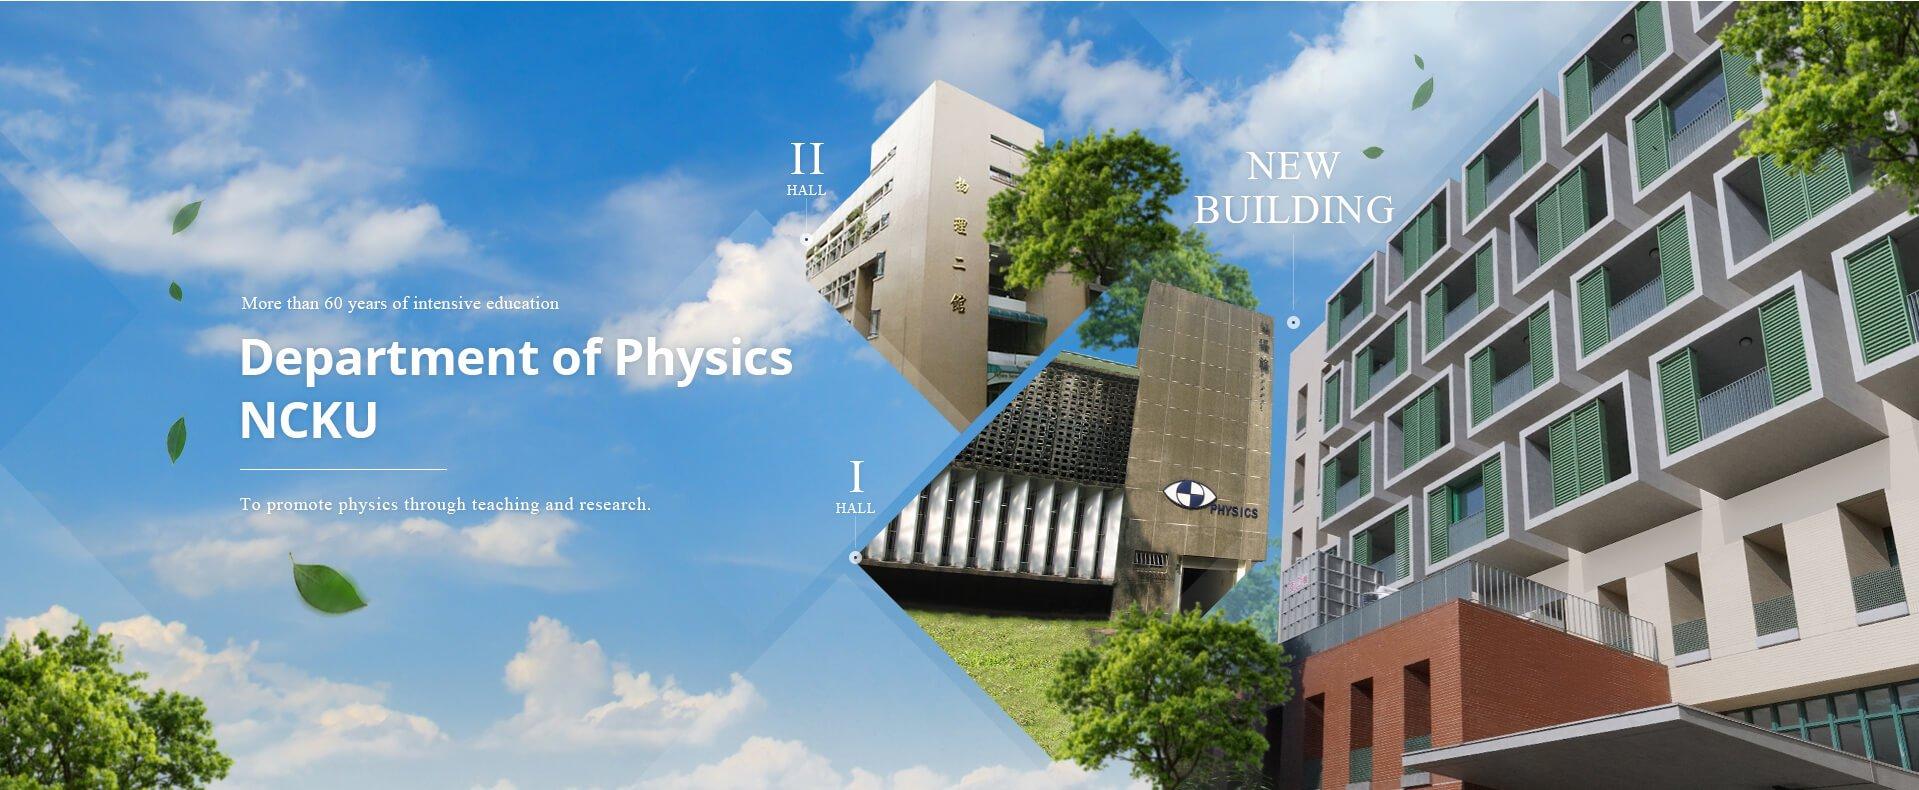 Department of Physics, National Cheng Kung University